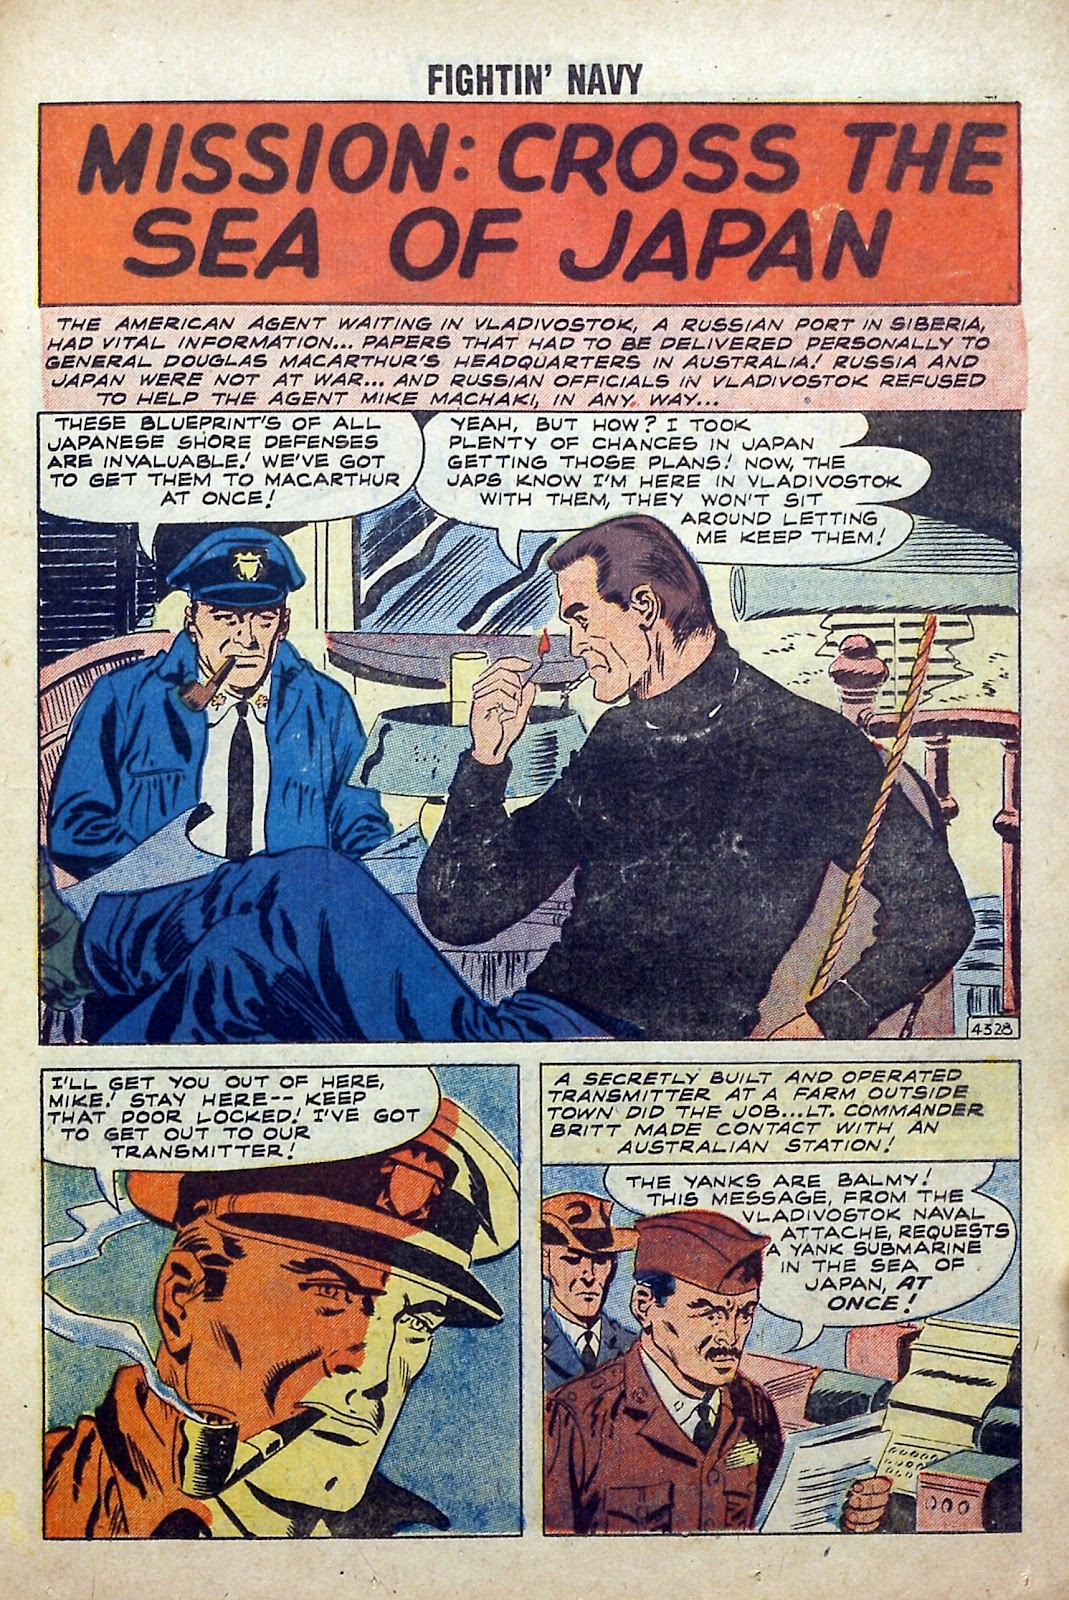 Read online Fightin' Navy comic -  Issue #84 - 23